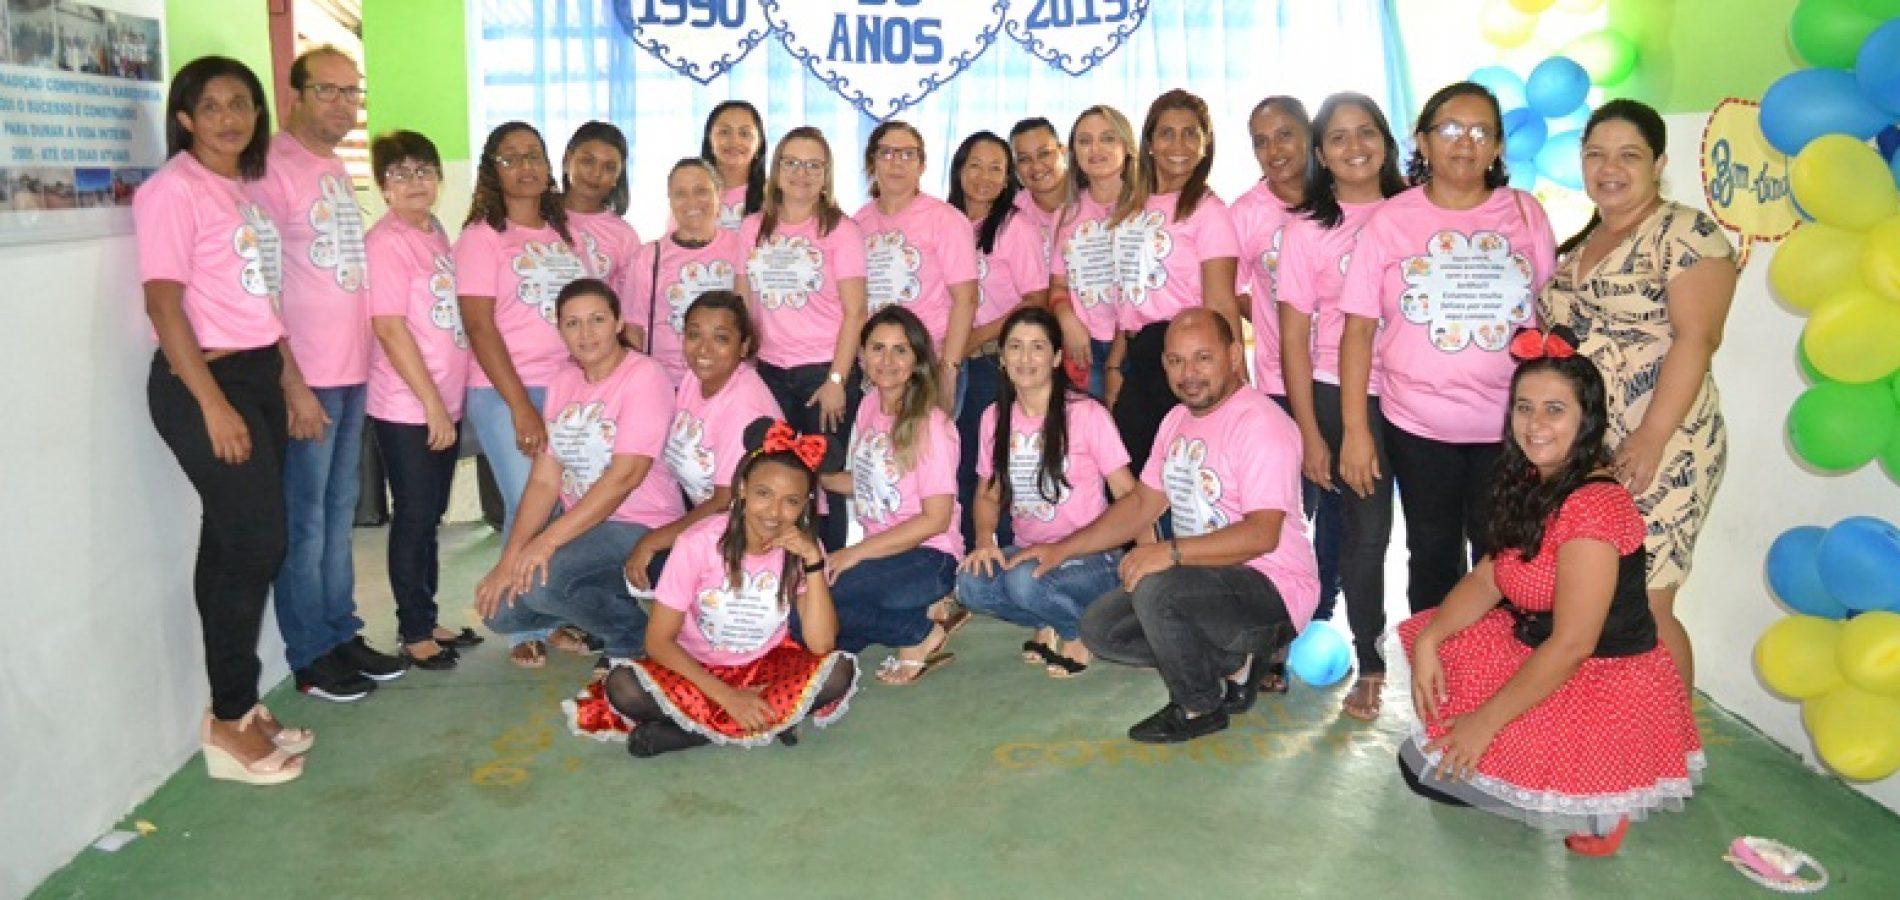 JAICÓS | Escola Pequeno Polegar inicia segundo semestre letivo nesta quinta-feira (01)